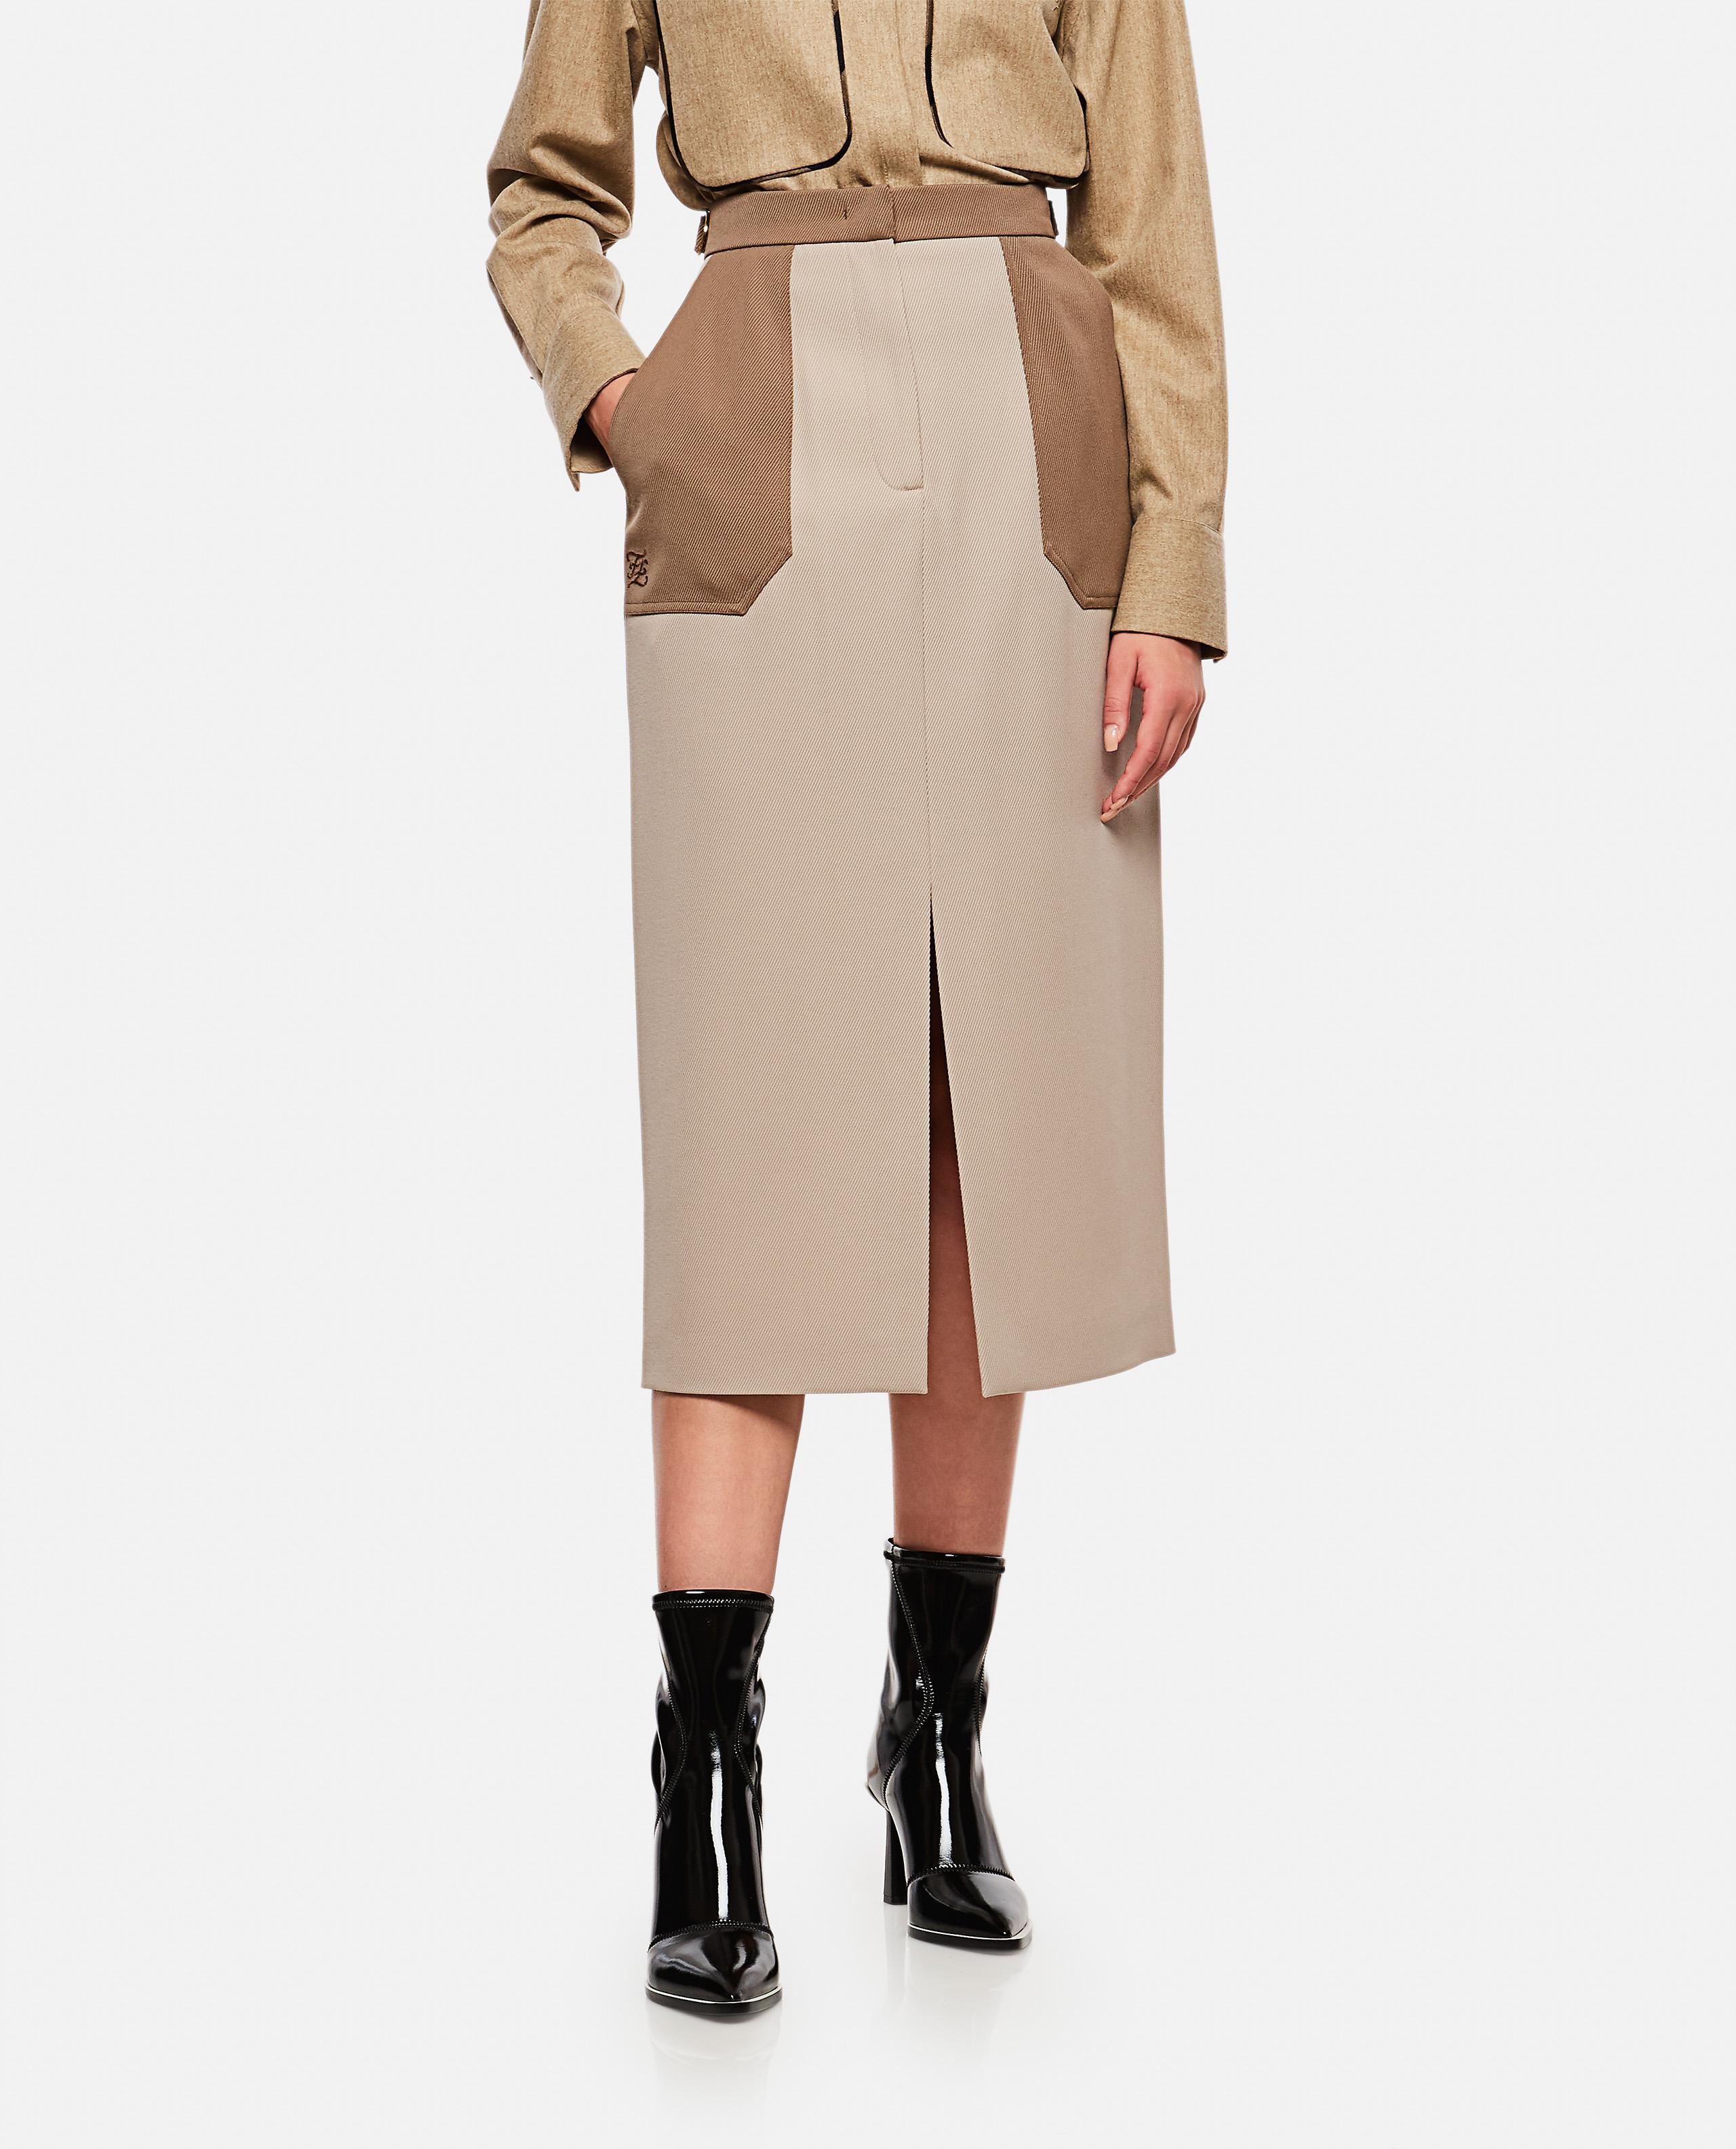 Wool gabardine midi skirt